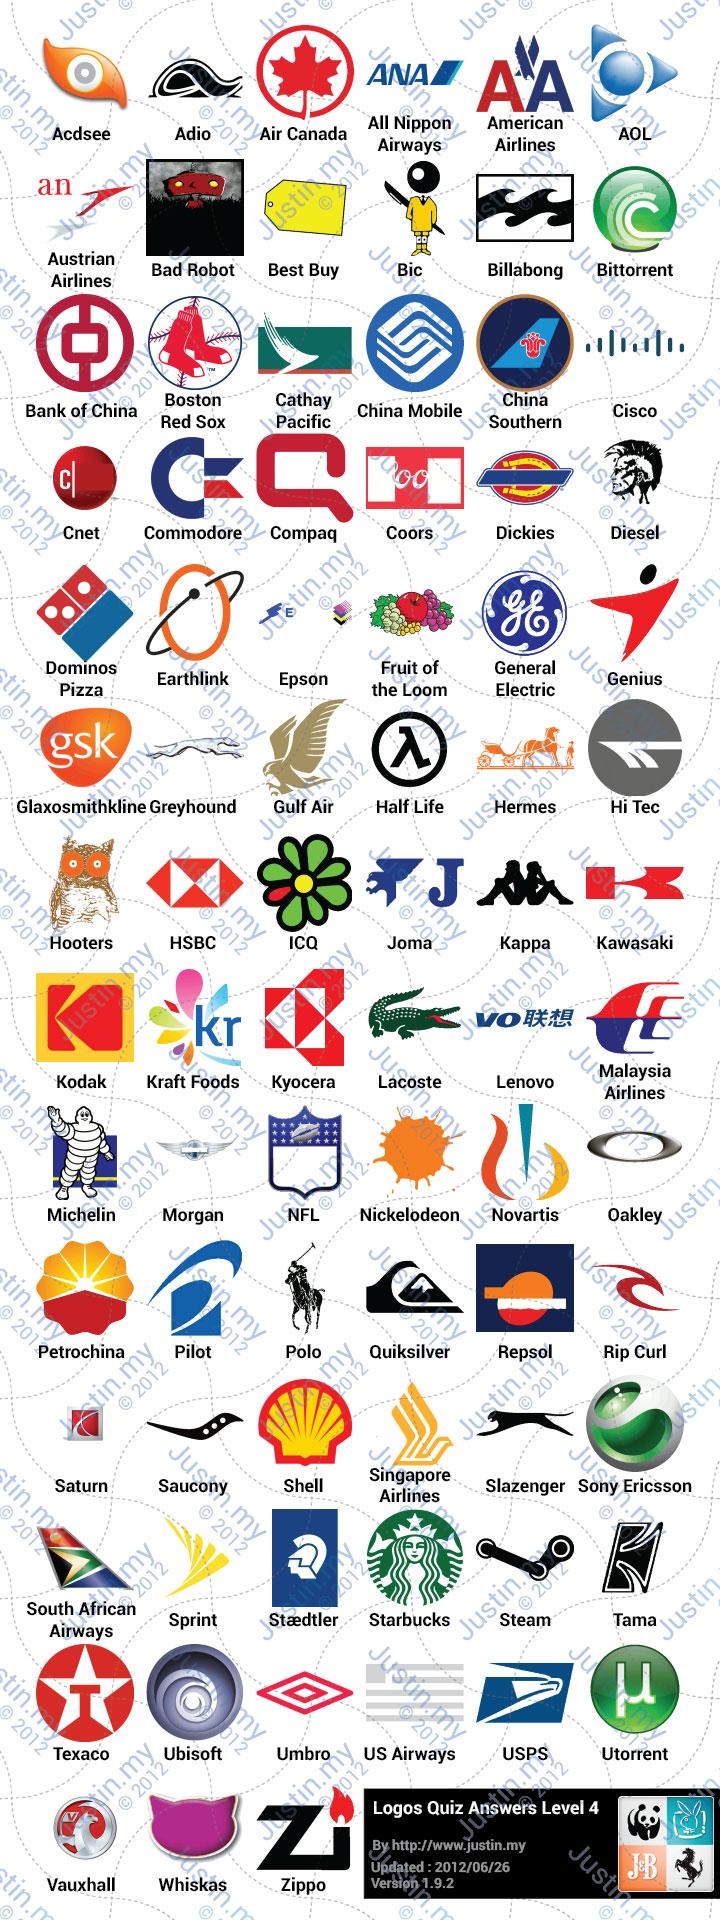 Logos Quiz Answers Level 4